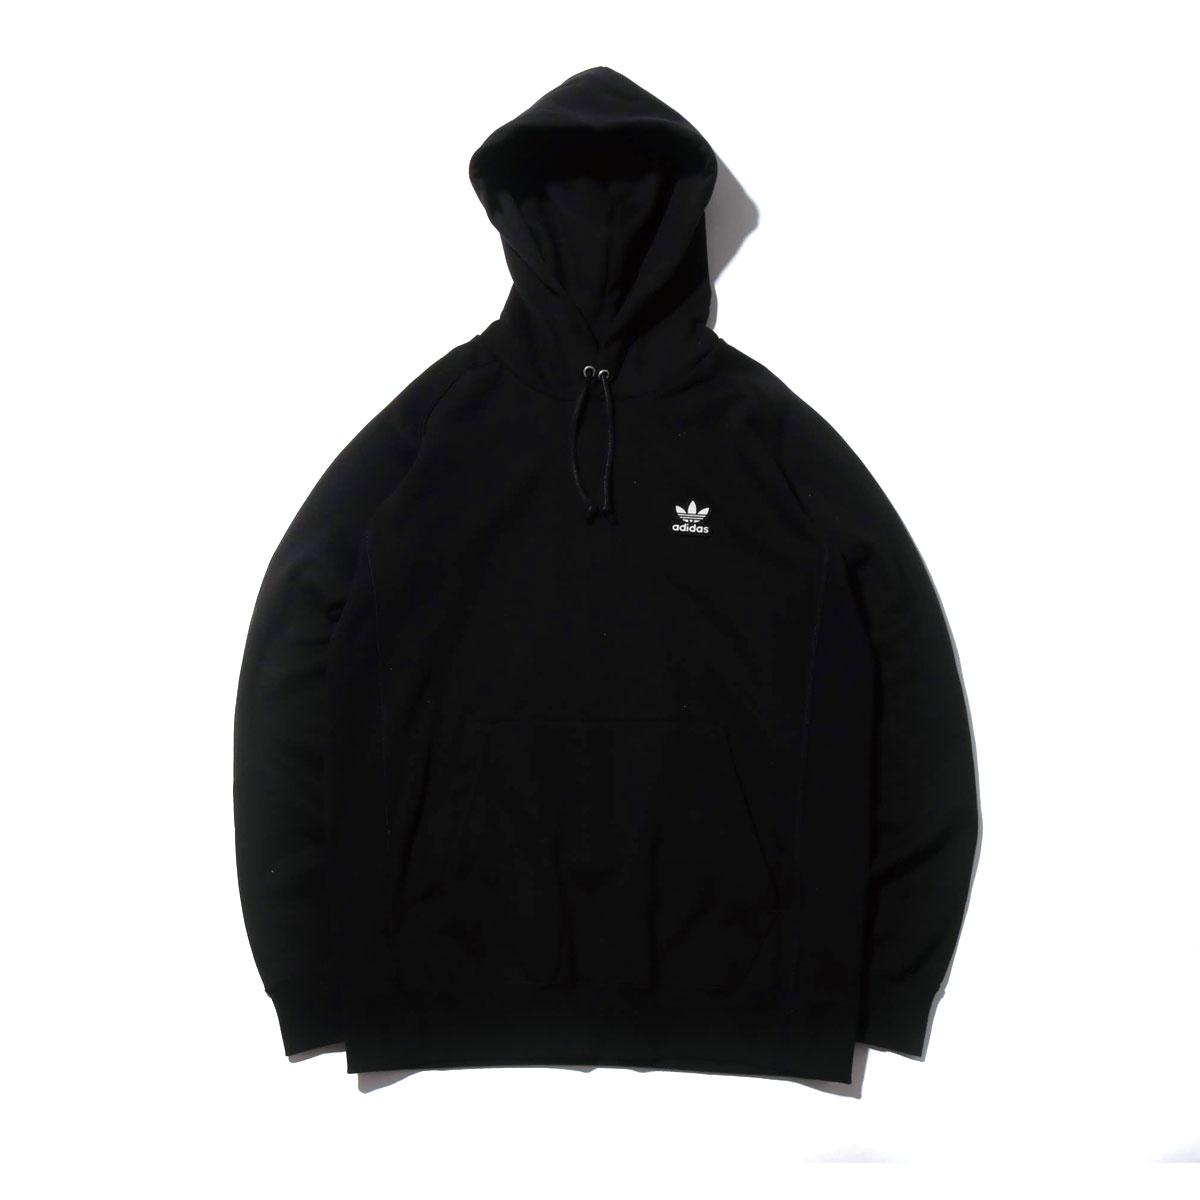 adidas Originals AC WAPPEN HOODIE(アディダスオリジナルス AC ワッペン フーディー)BLACK【メンズ パーカー】19SS-I